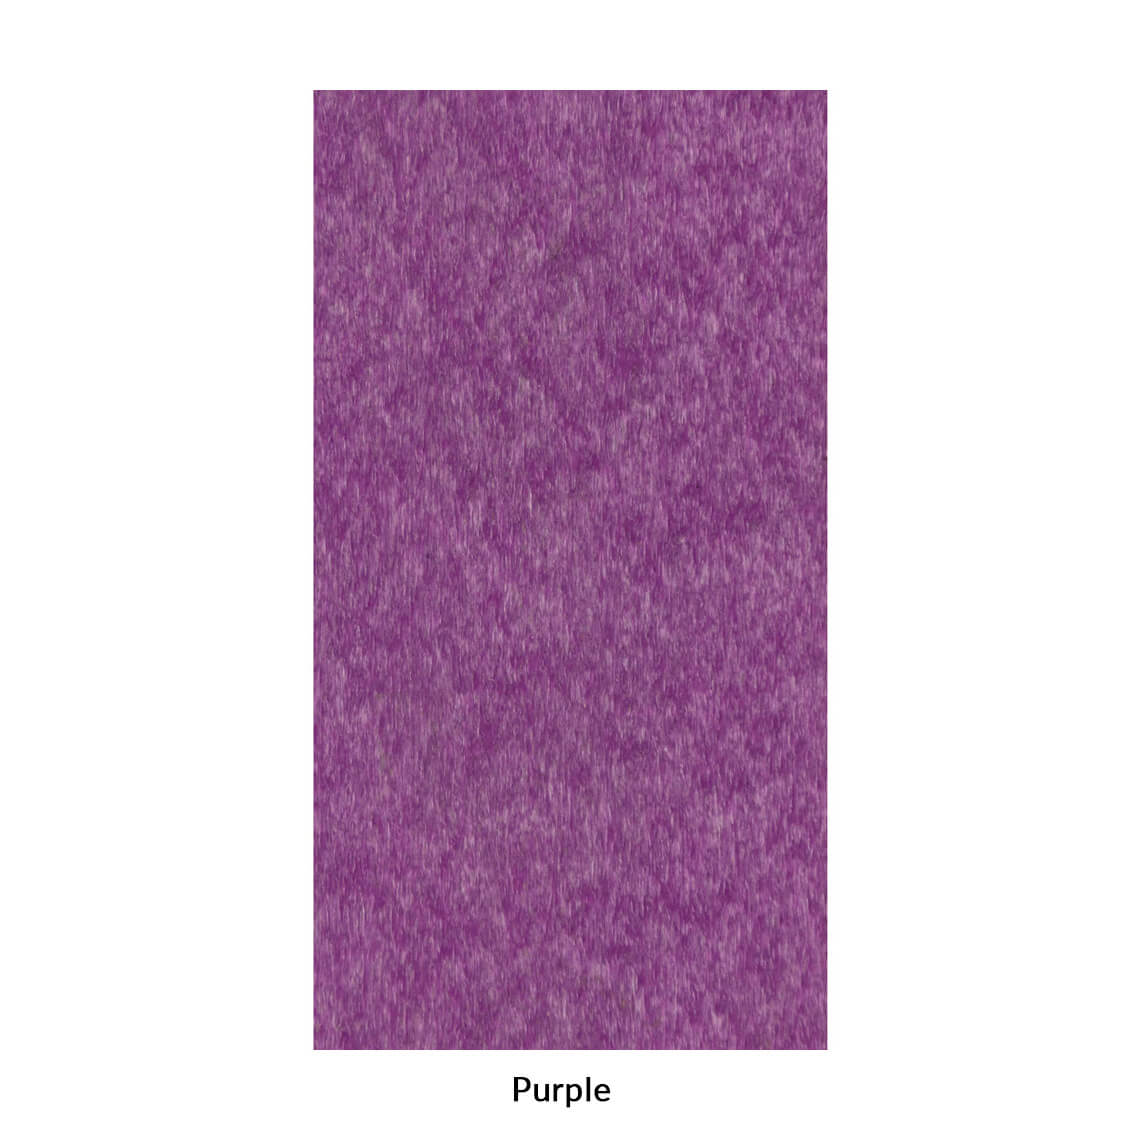 18.-purple.jpg